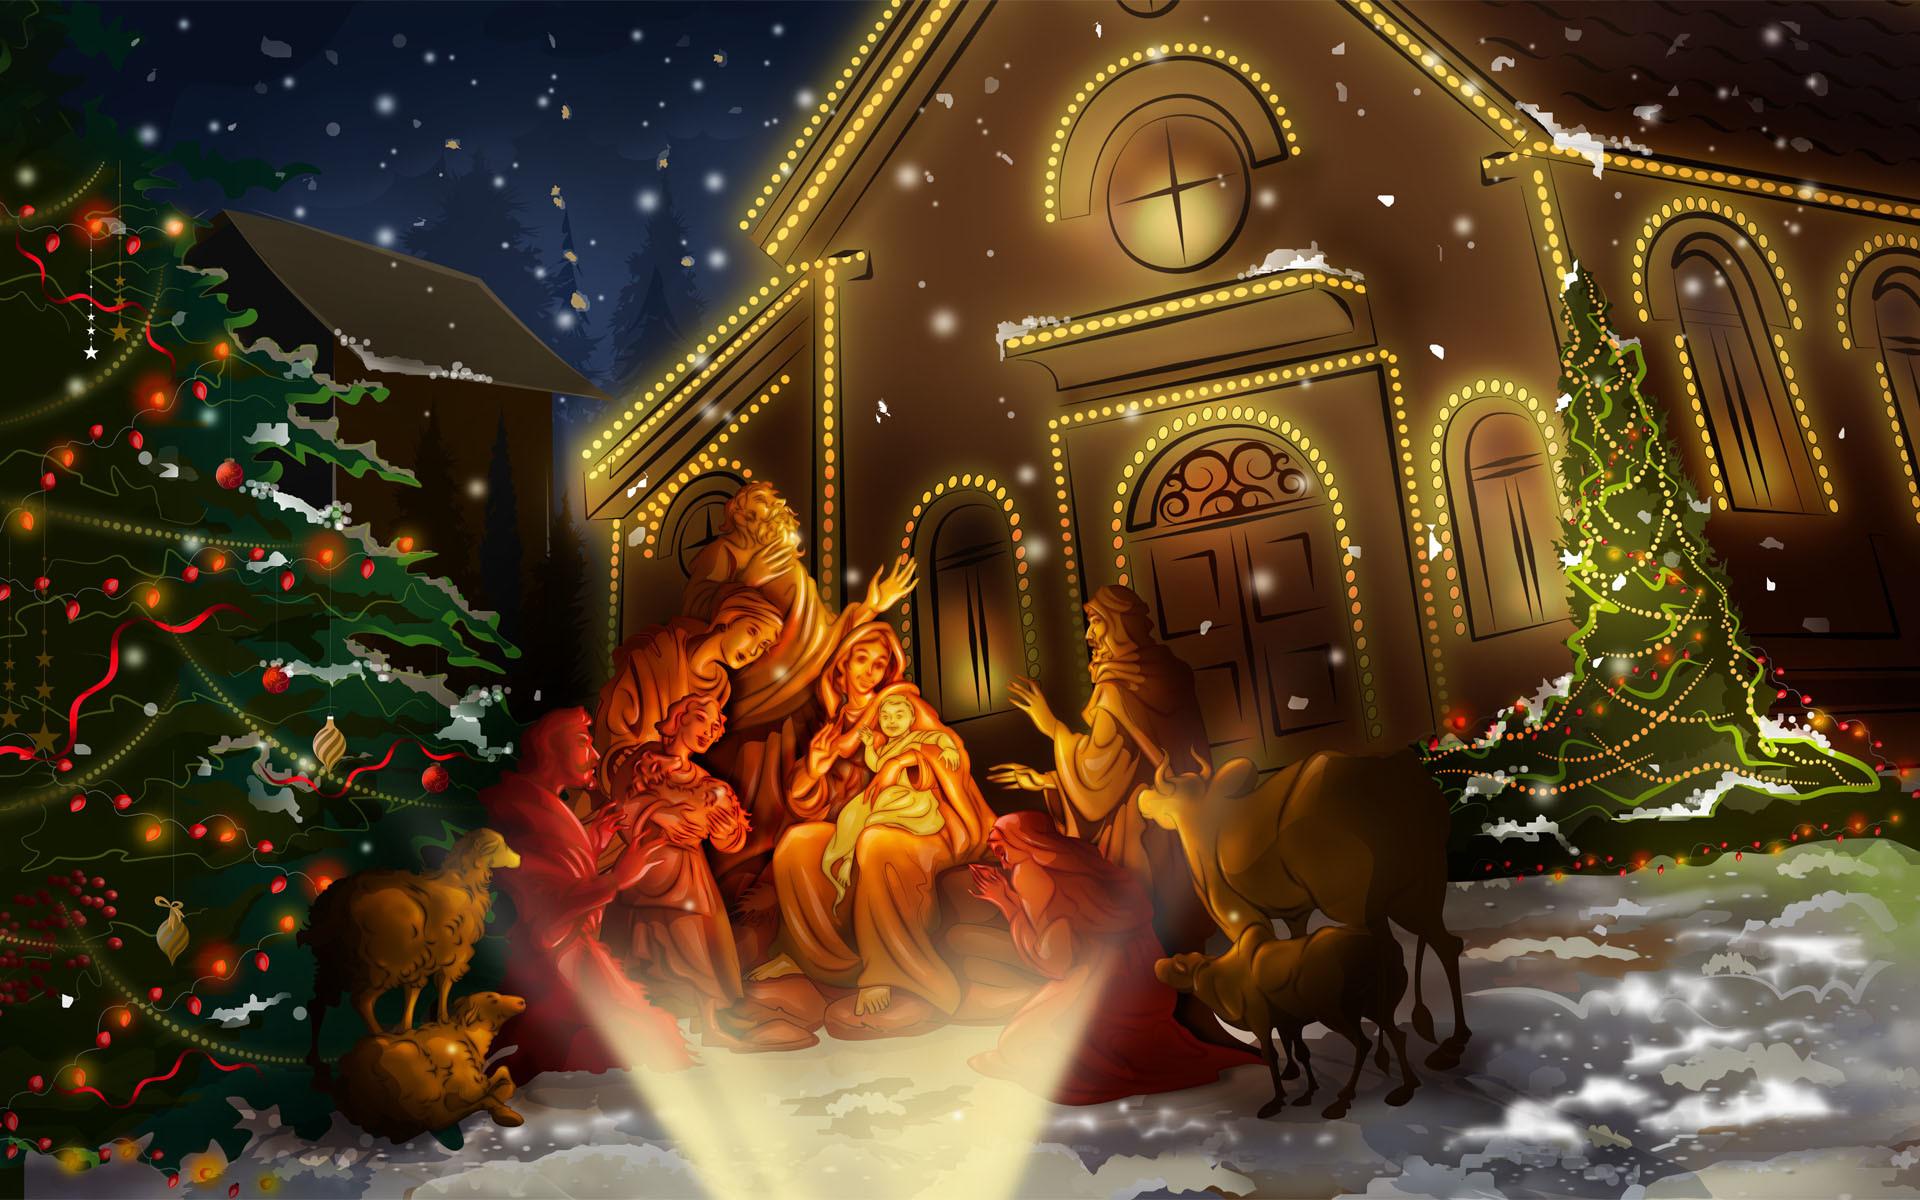 Merry Christmas Jesus Wallpaper (12)